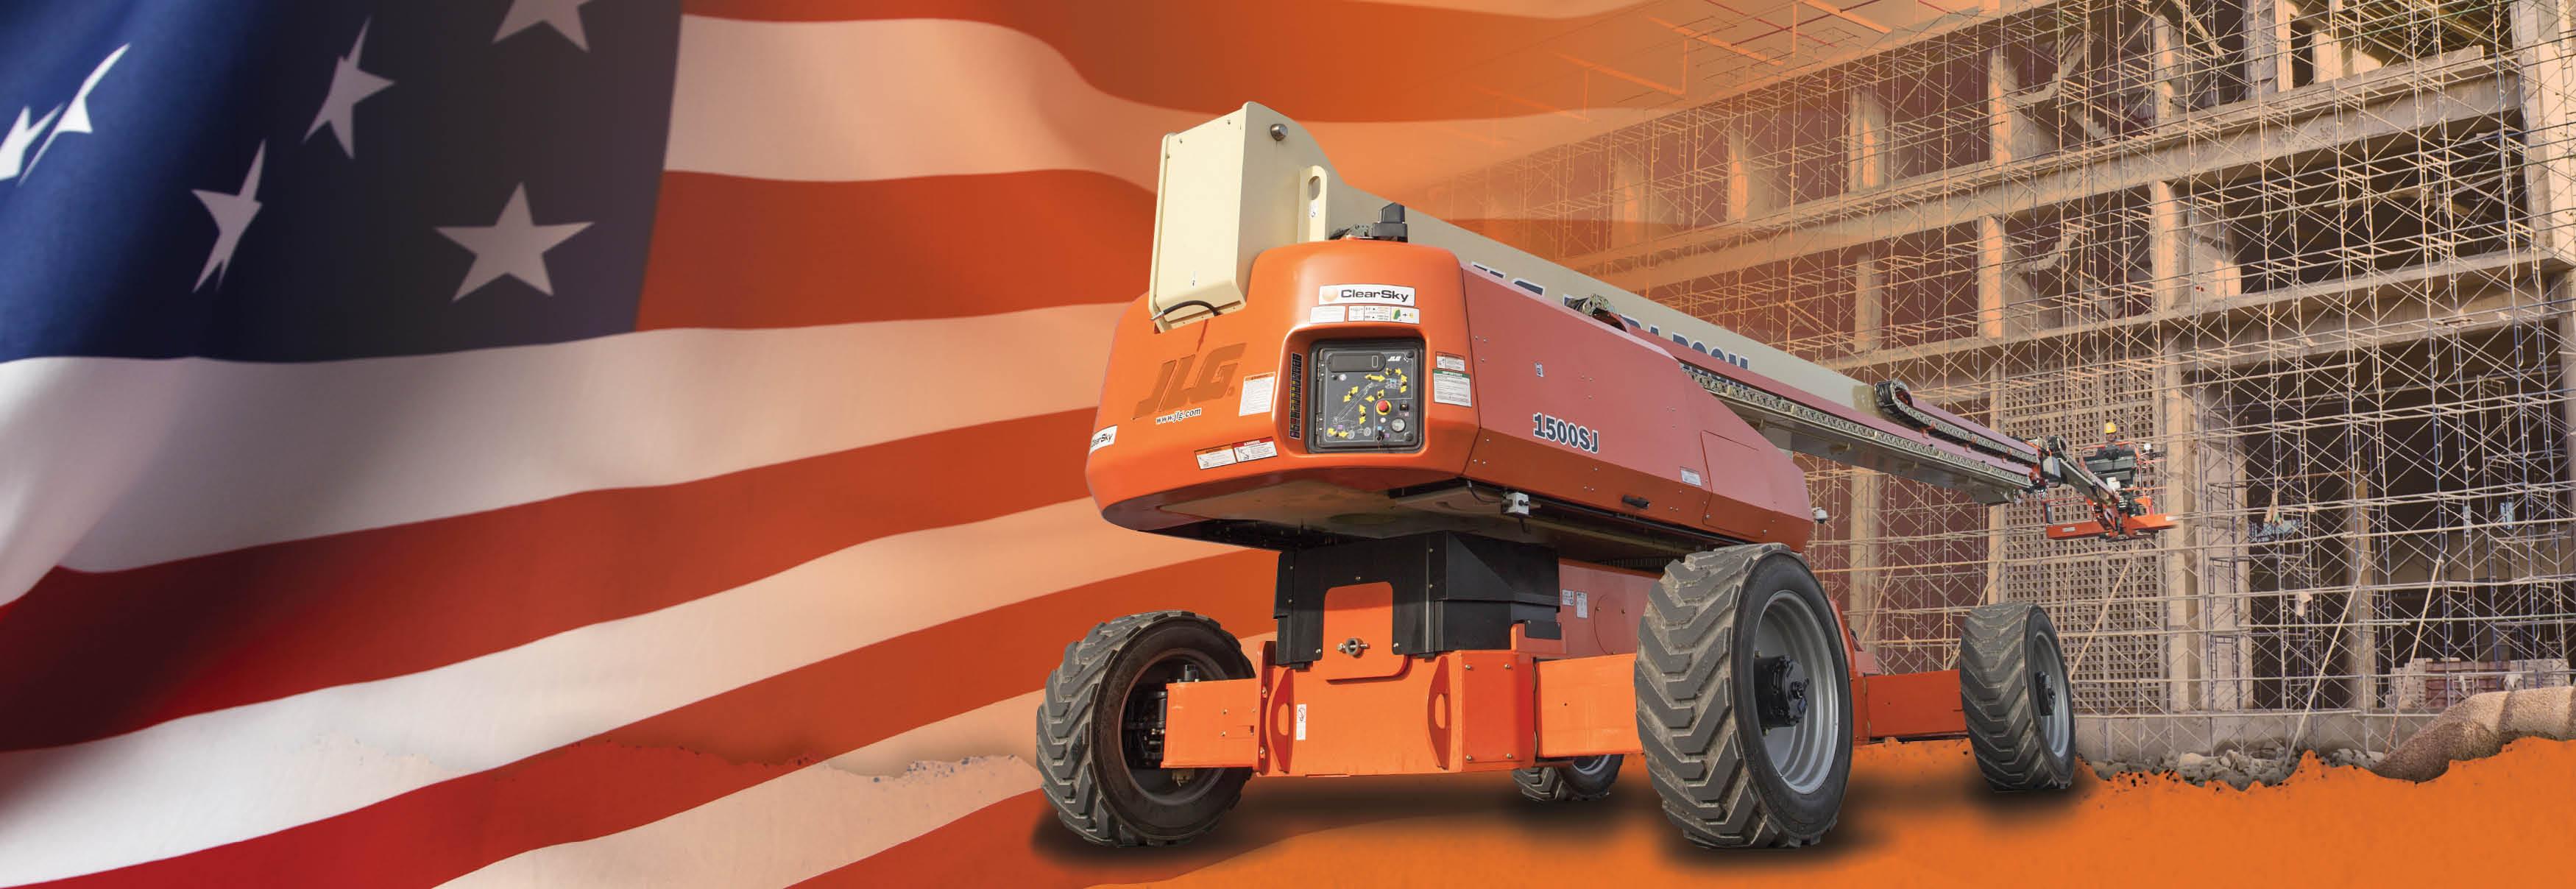 JLG: Built In America Since 1969